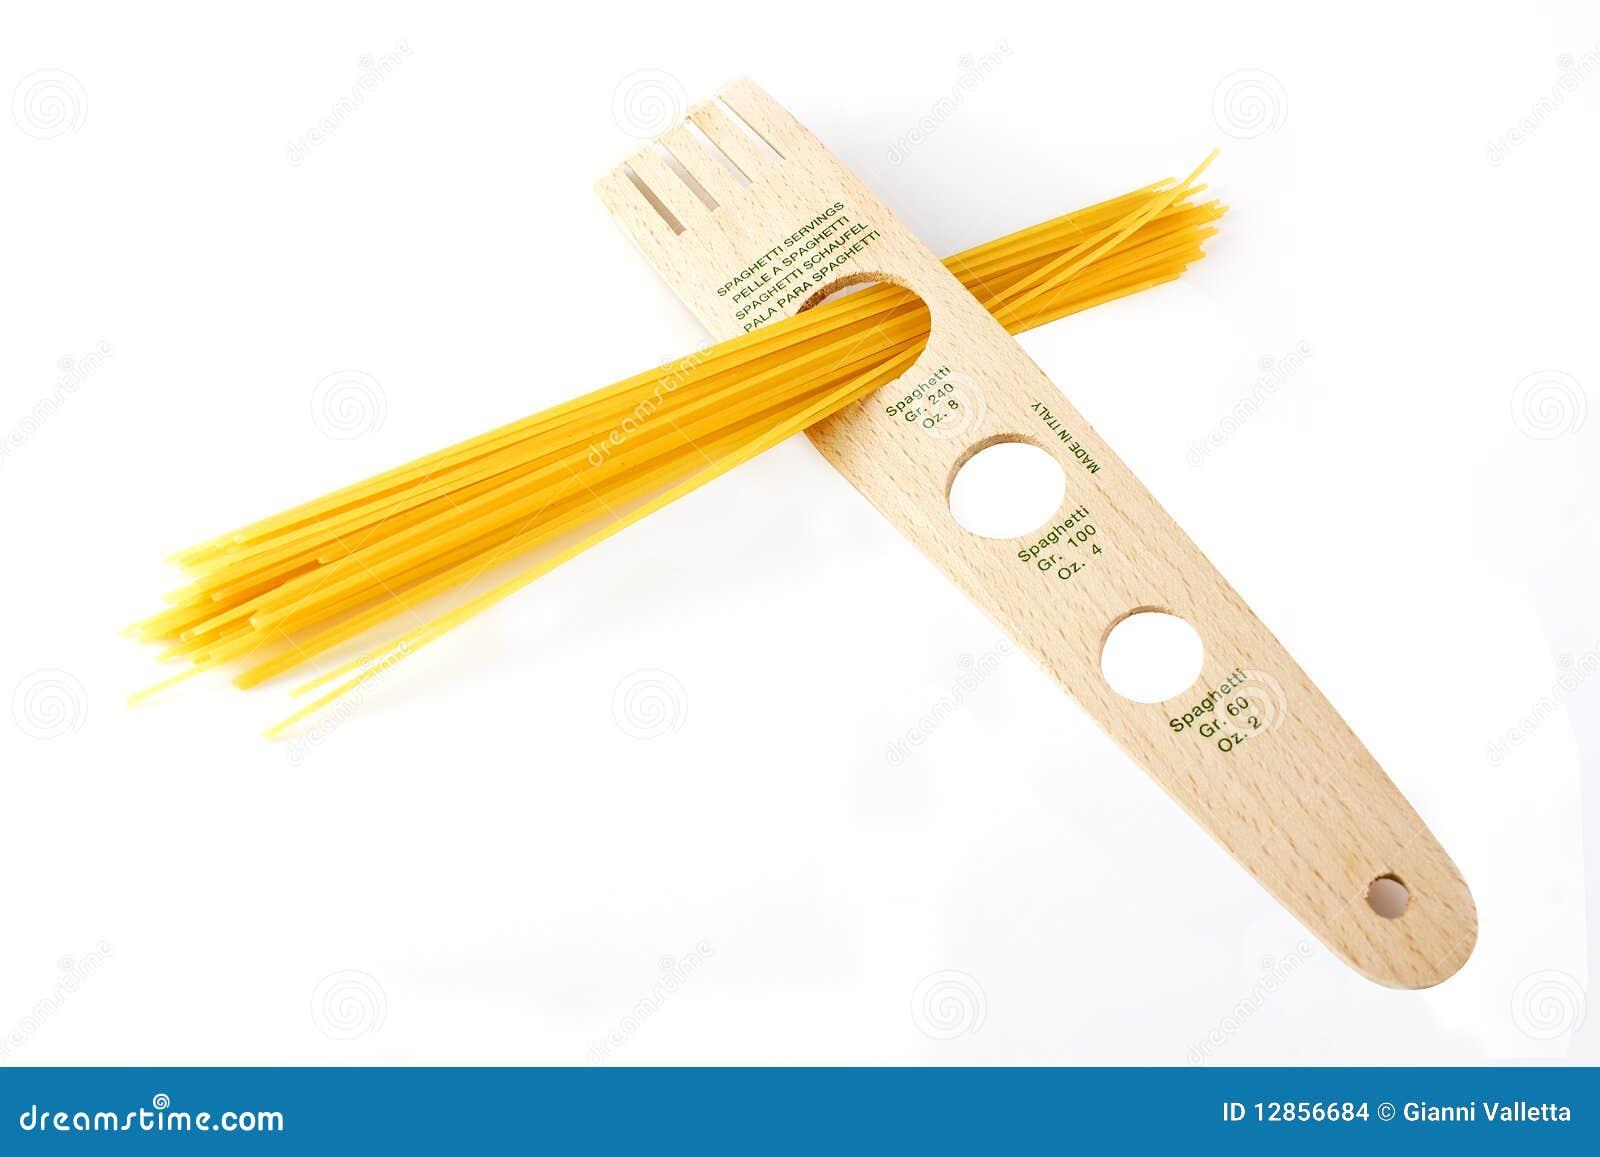 Spaghetti servings